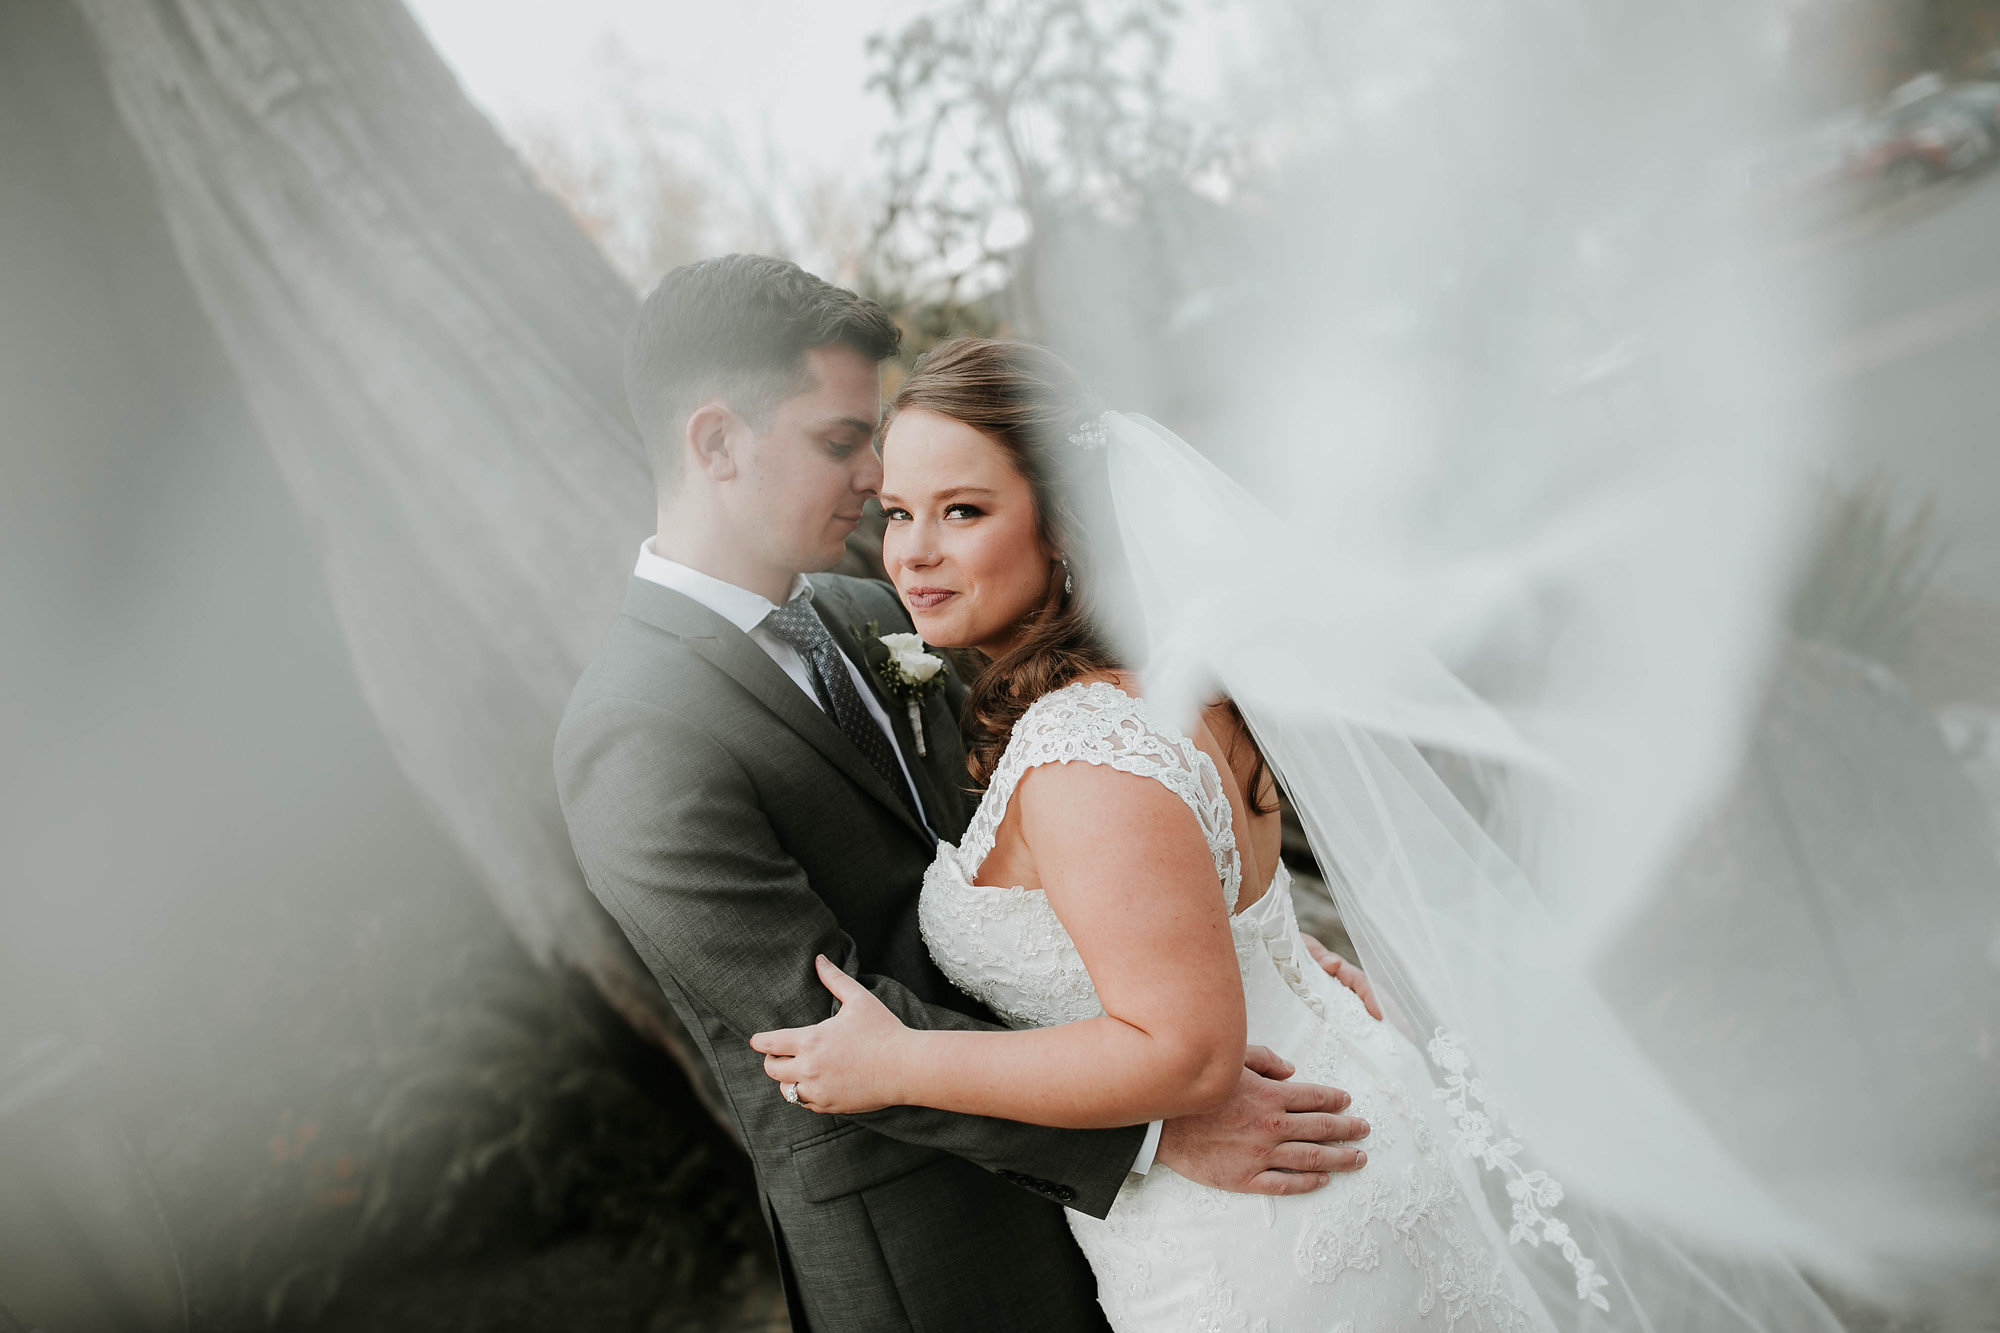 Willows_Lodge_Wedding_Russells_restaurant_wedding_L&J_Seattle_wedding_photographer_449.JPG